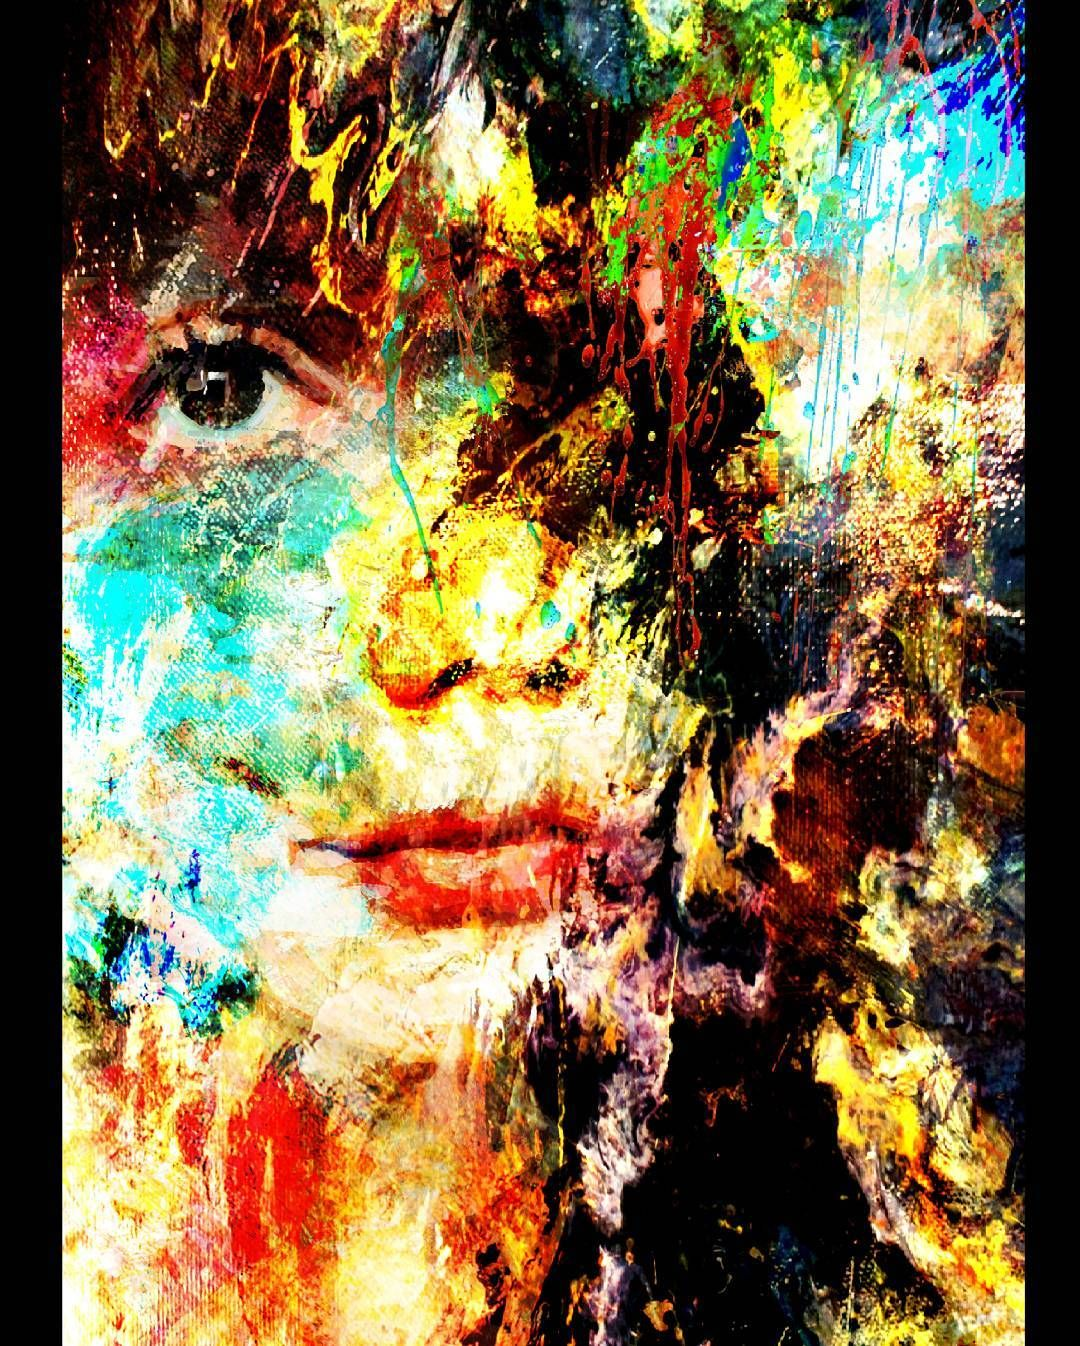 mac on   art by mackill com   Art, Painting, Online art gallery